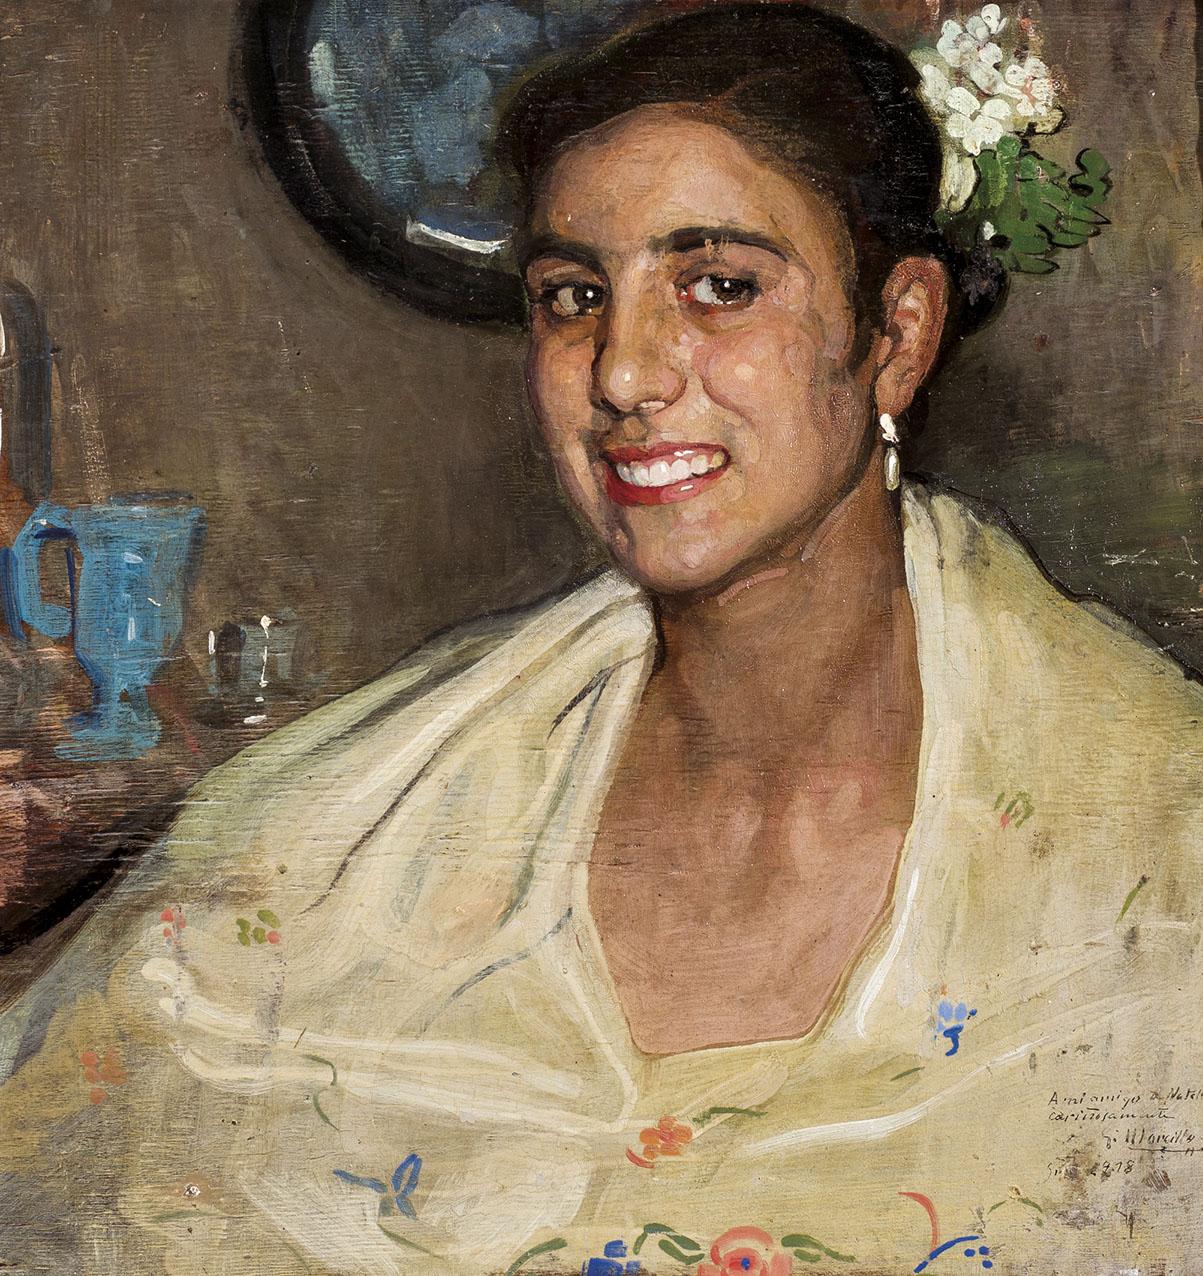 Gabriel-Morcillo-Joven-junto-al-espejo-1918